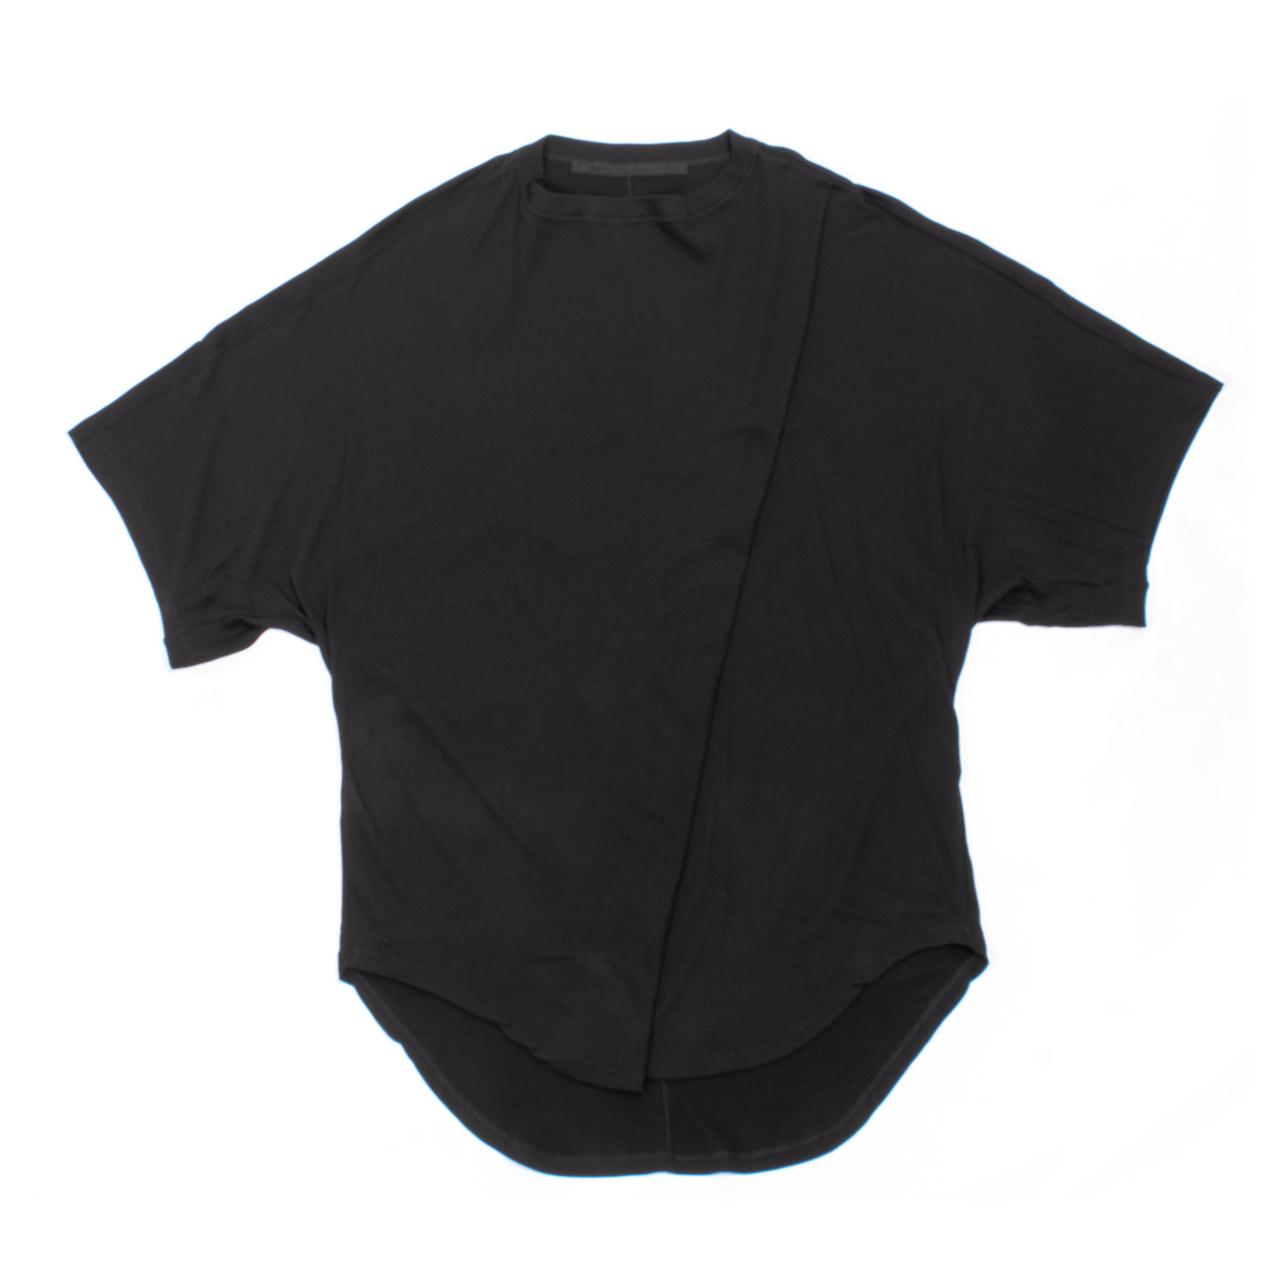 707CUM6-BLACK / ドロップカラー オーバーサイズ Tシャツ